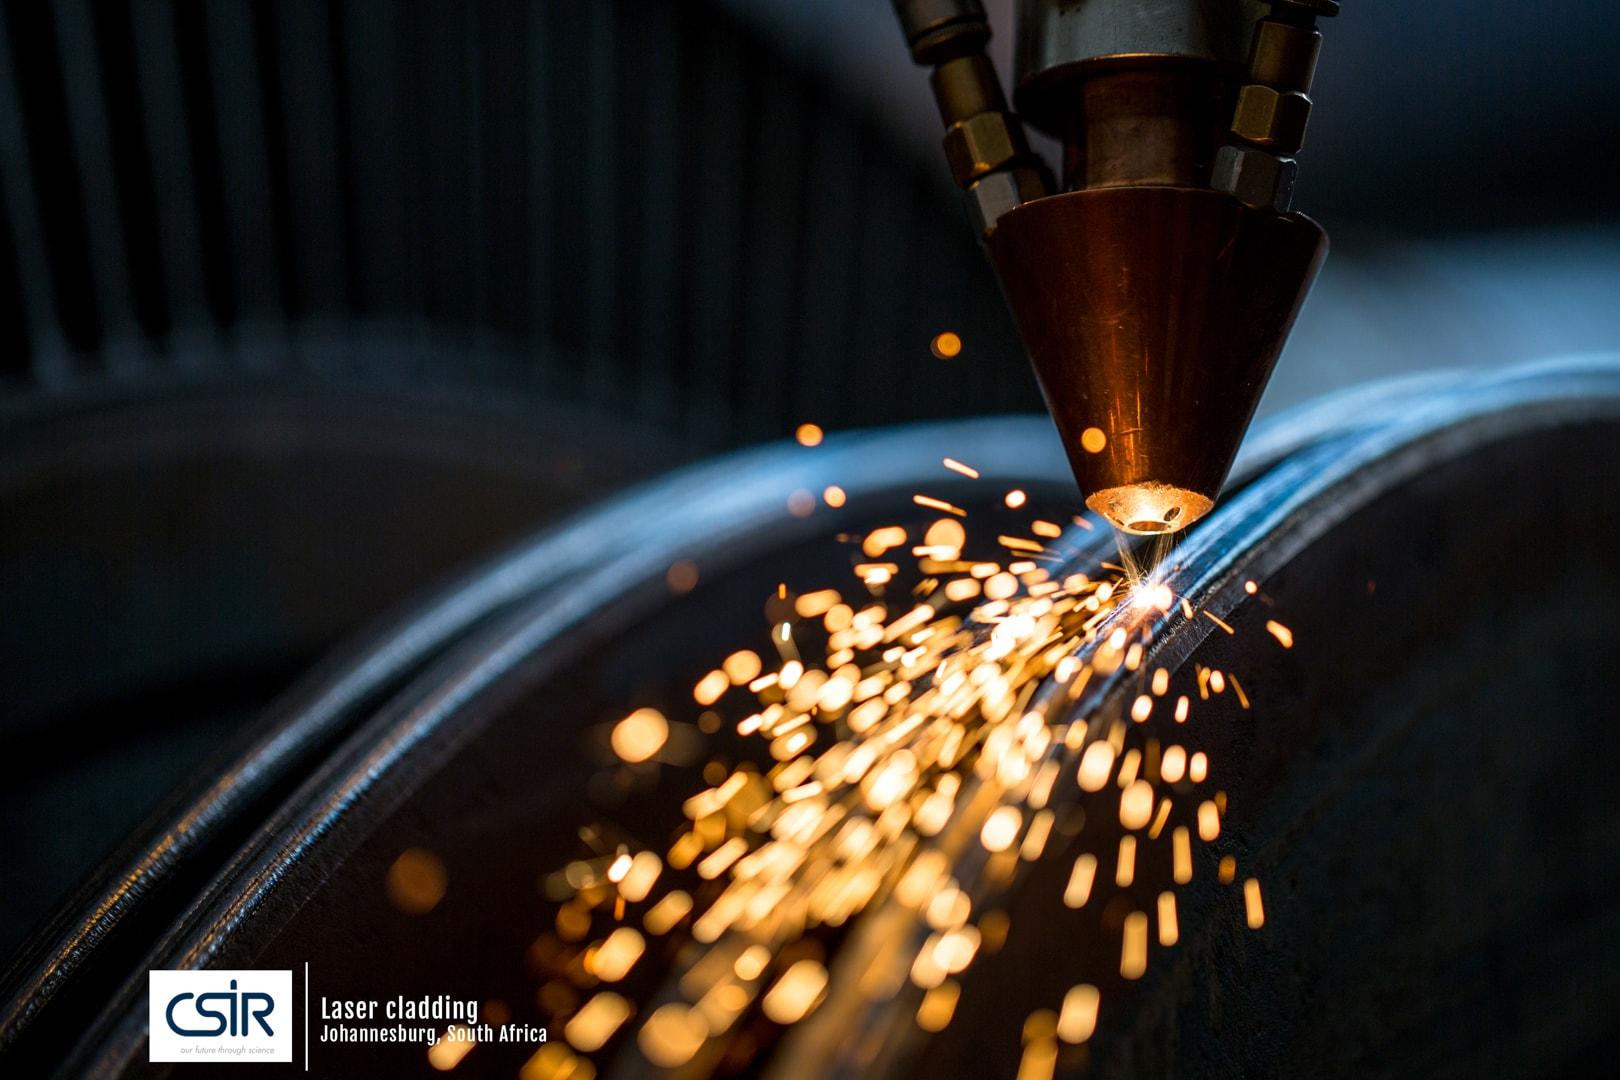 Photo of Laser cladding